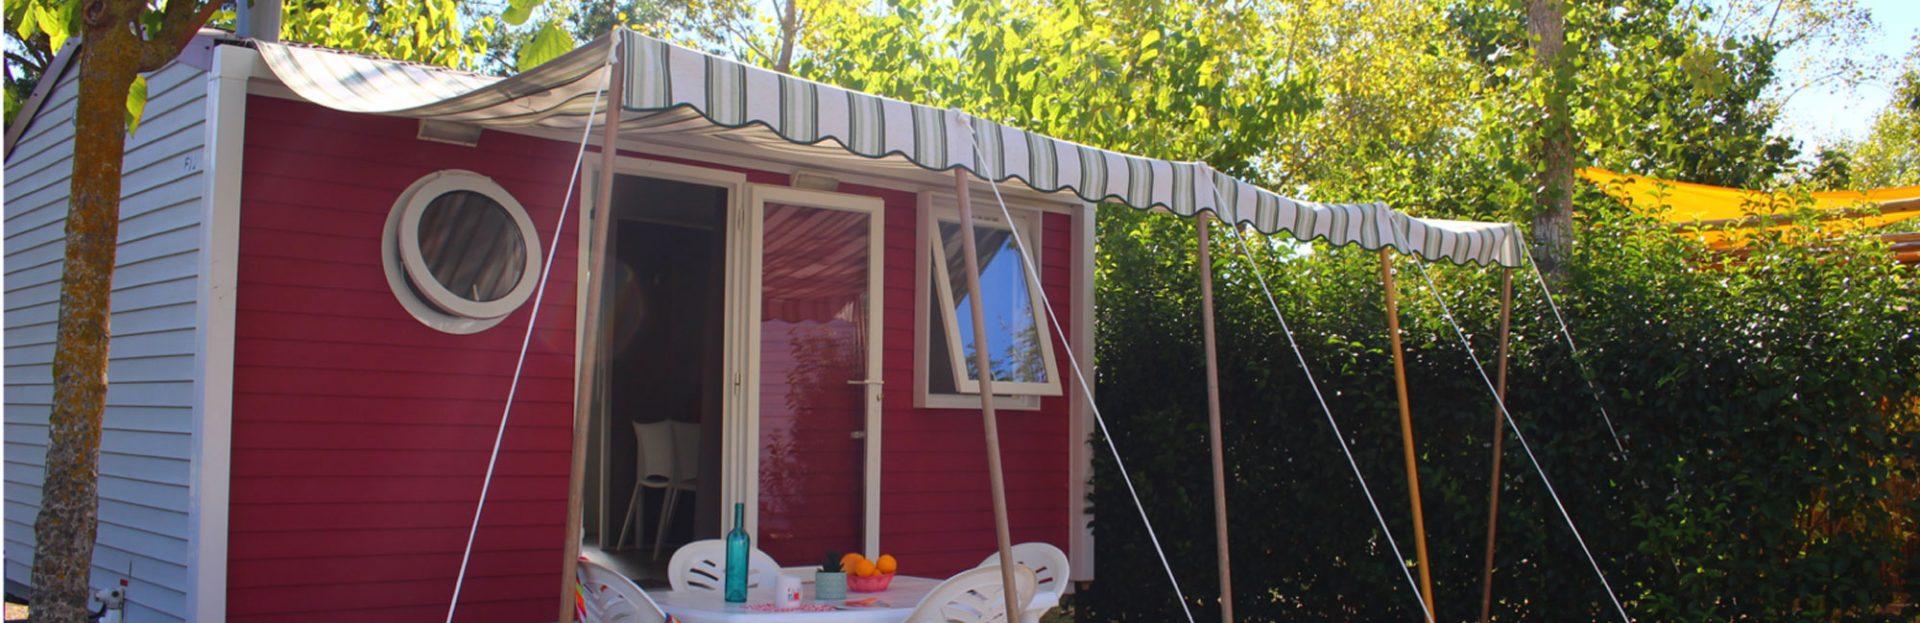 Camping L'air Marin : Pequeno Principale Diapo